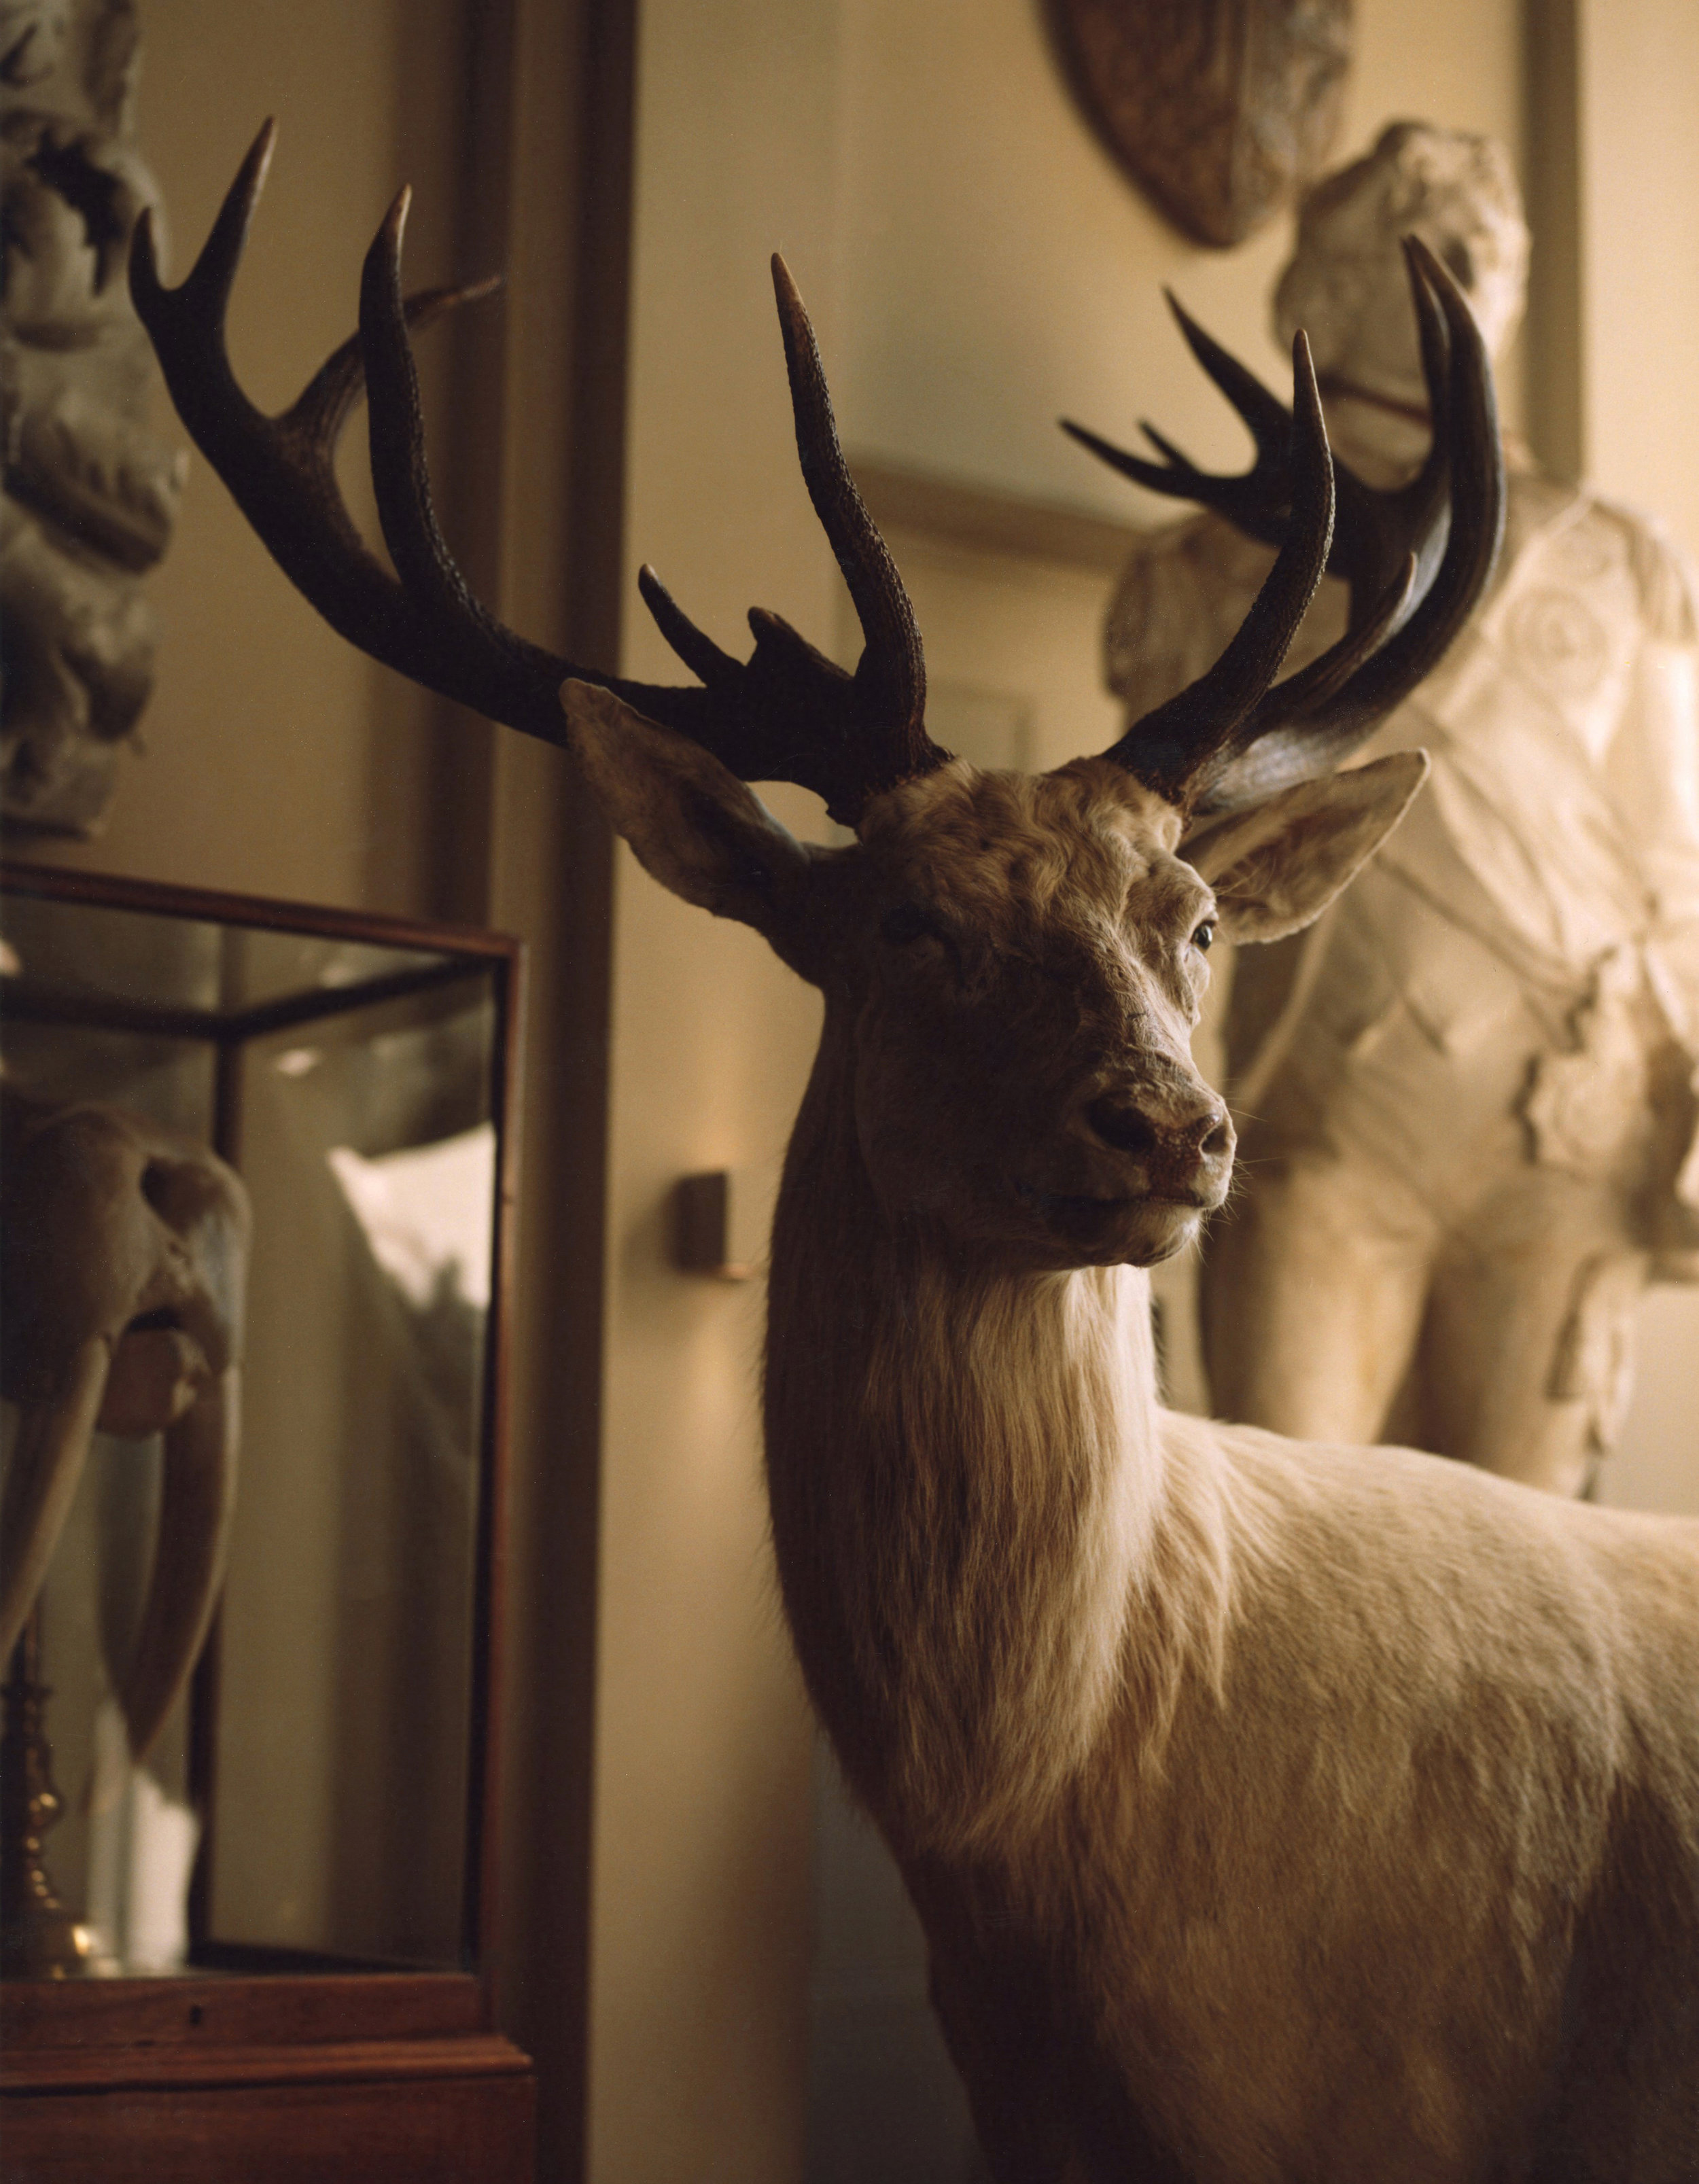 Deer stalking with Brett Graham for The Financial Times Magazine